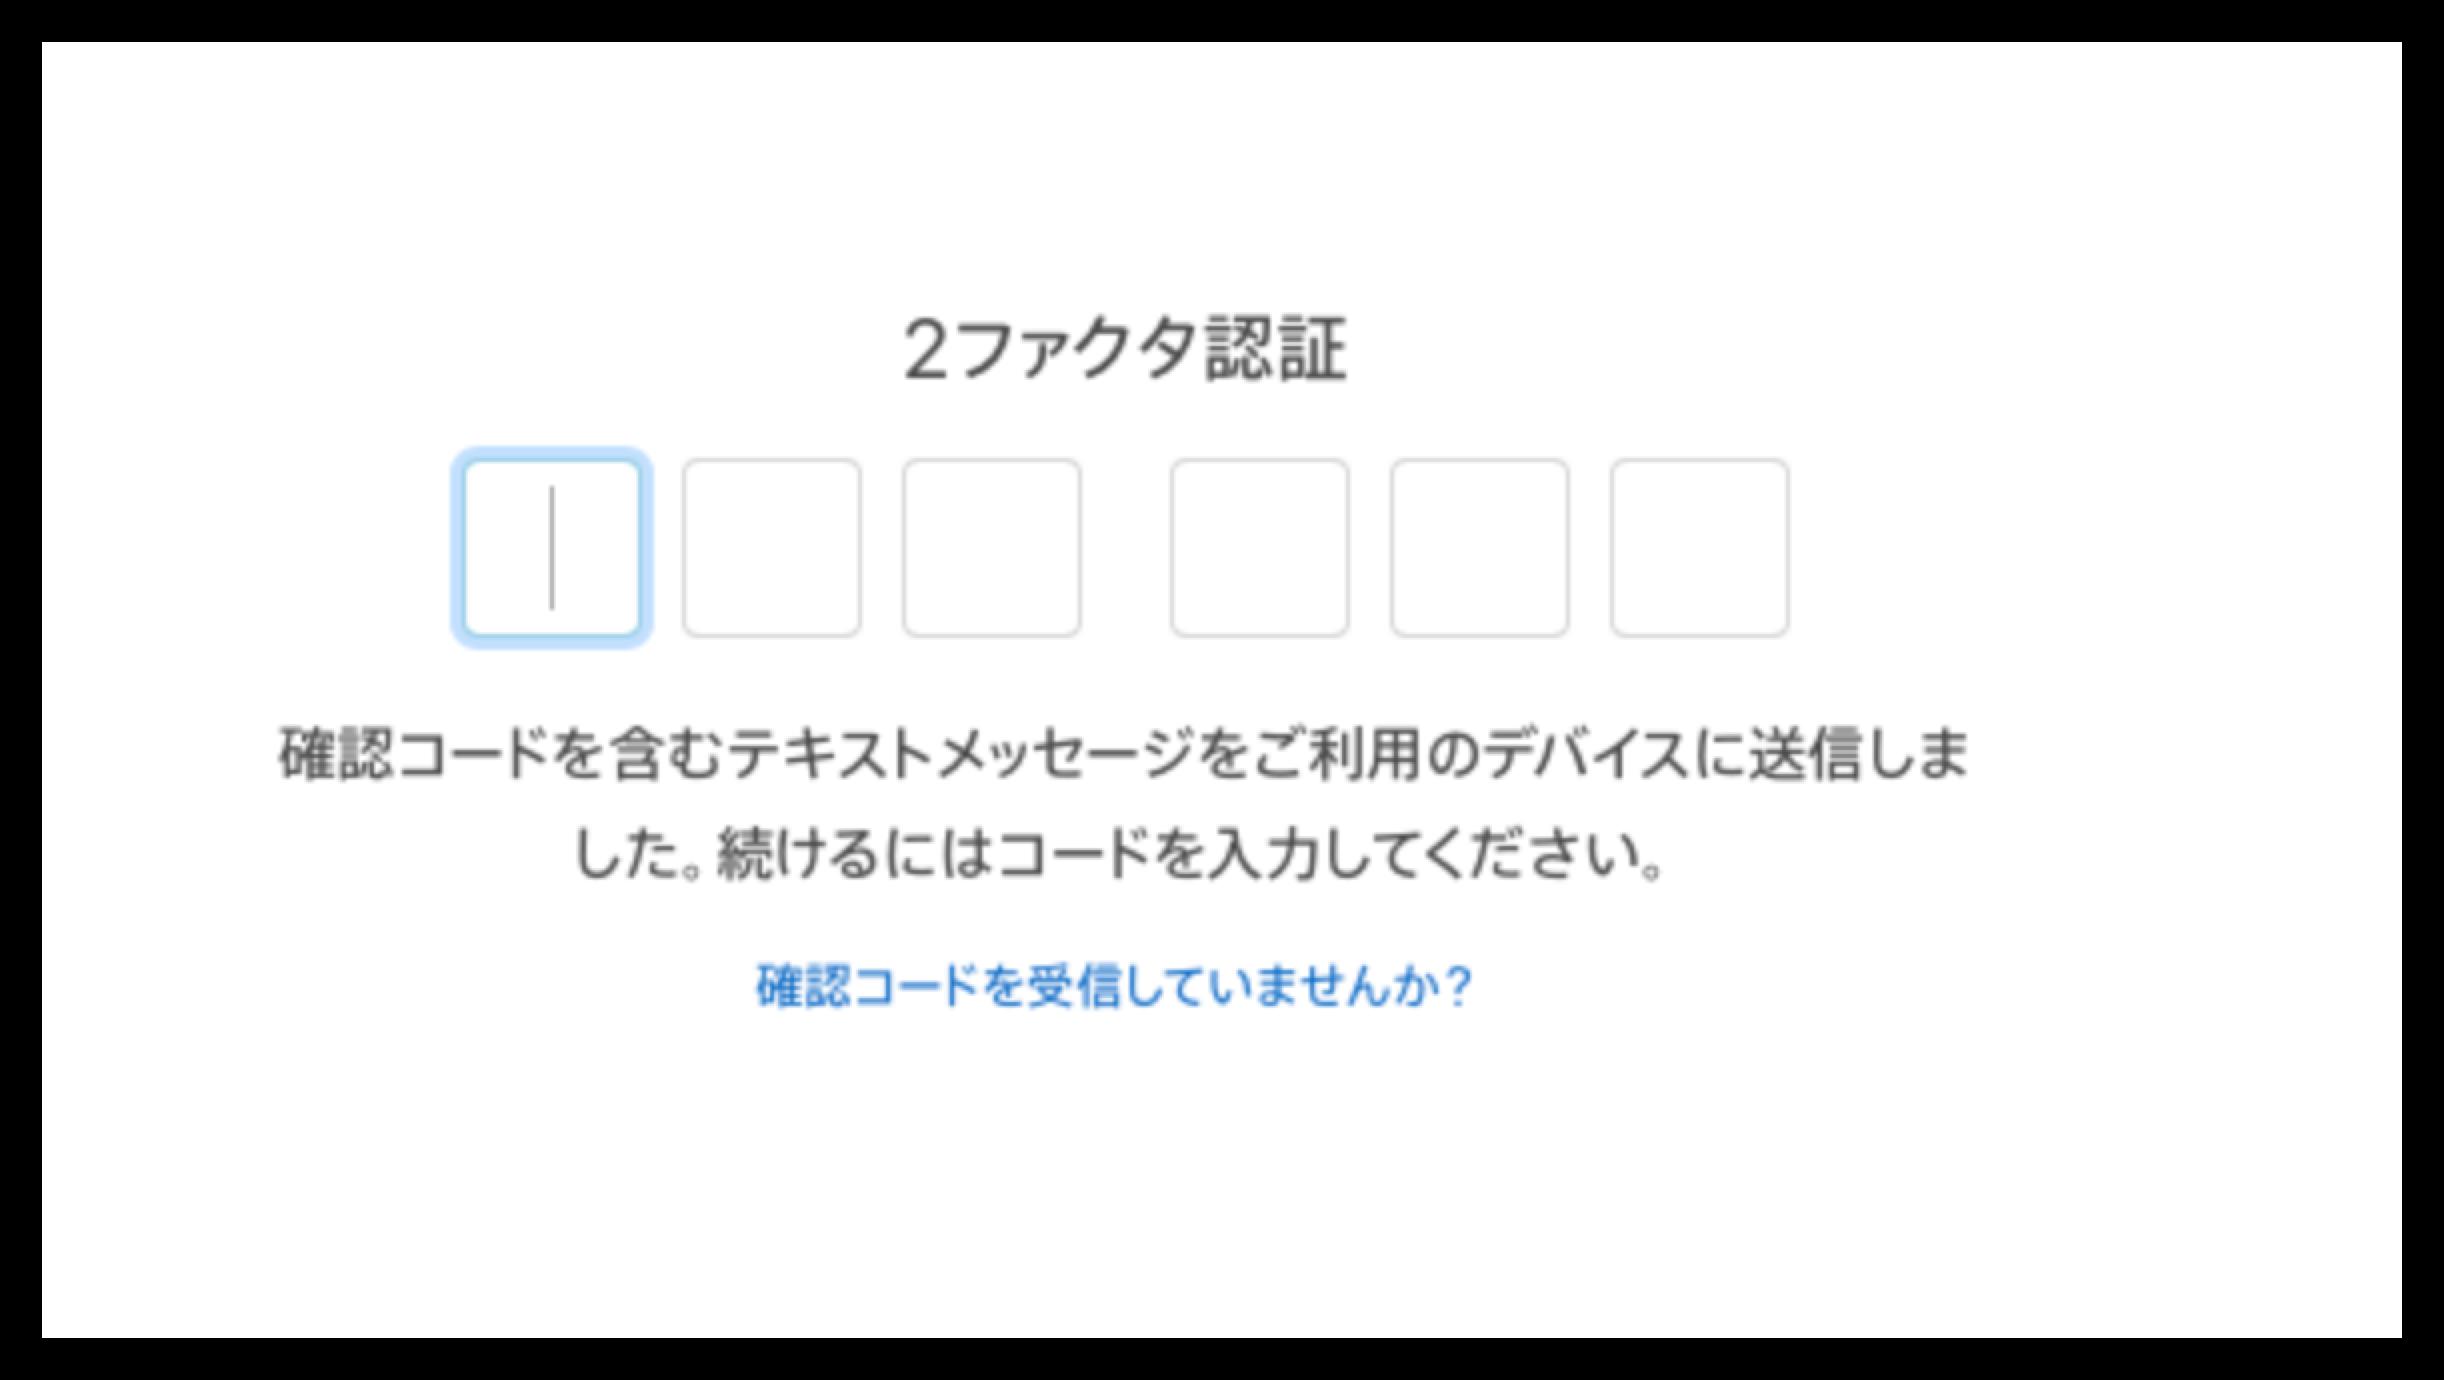 DropShadow ~ スクリーンショット 2019-02-28 15.35.31.png